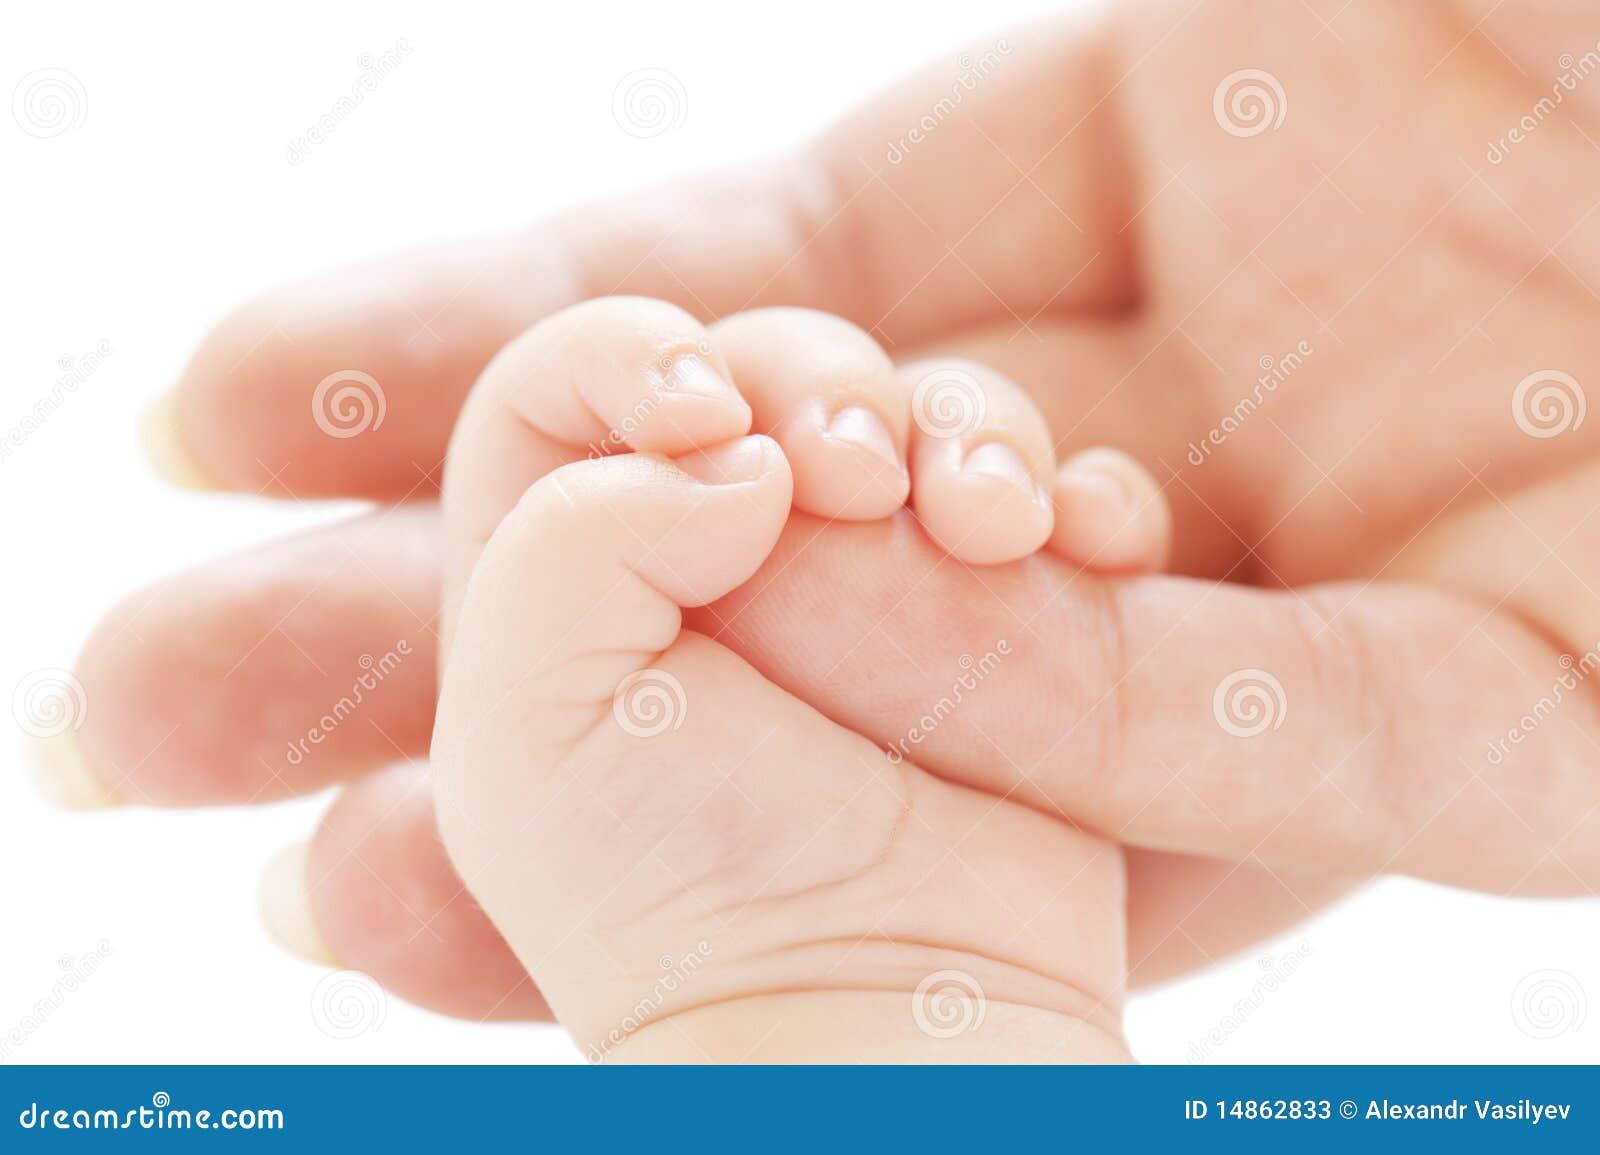 картинки ребенка и матери